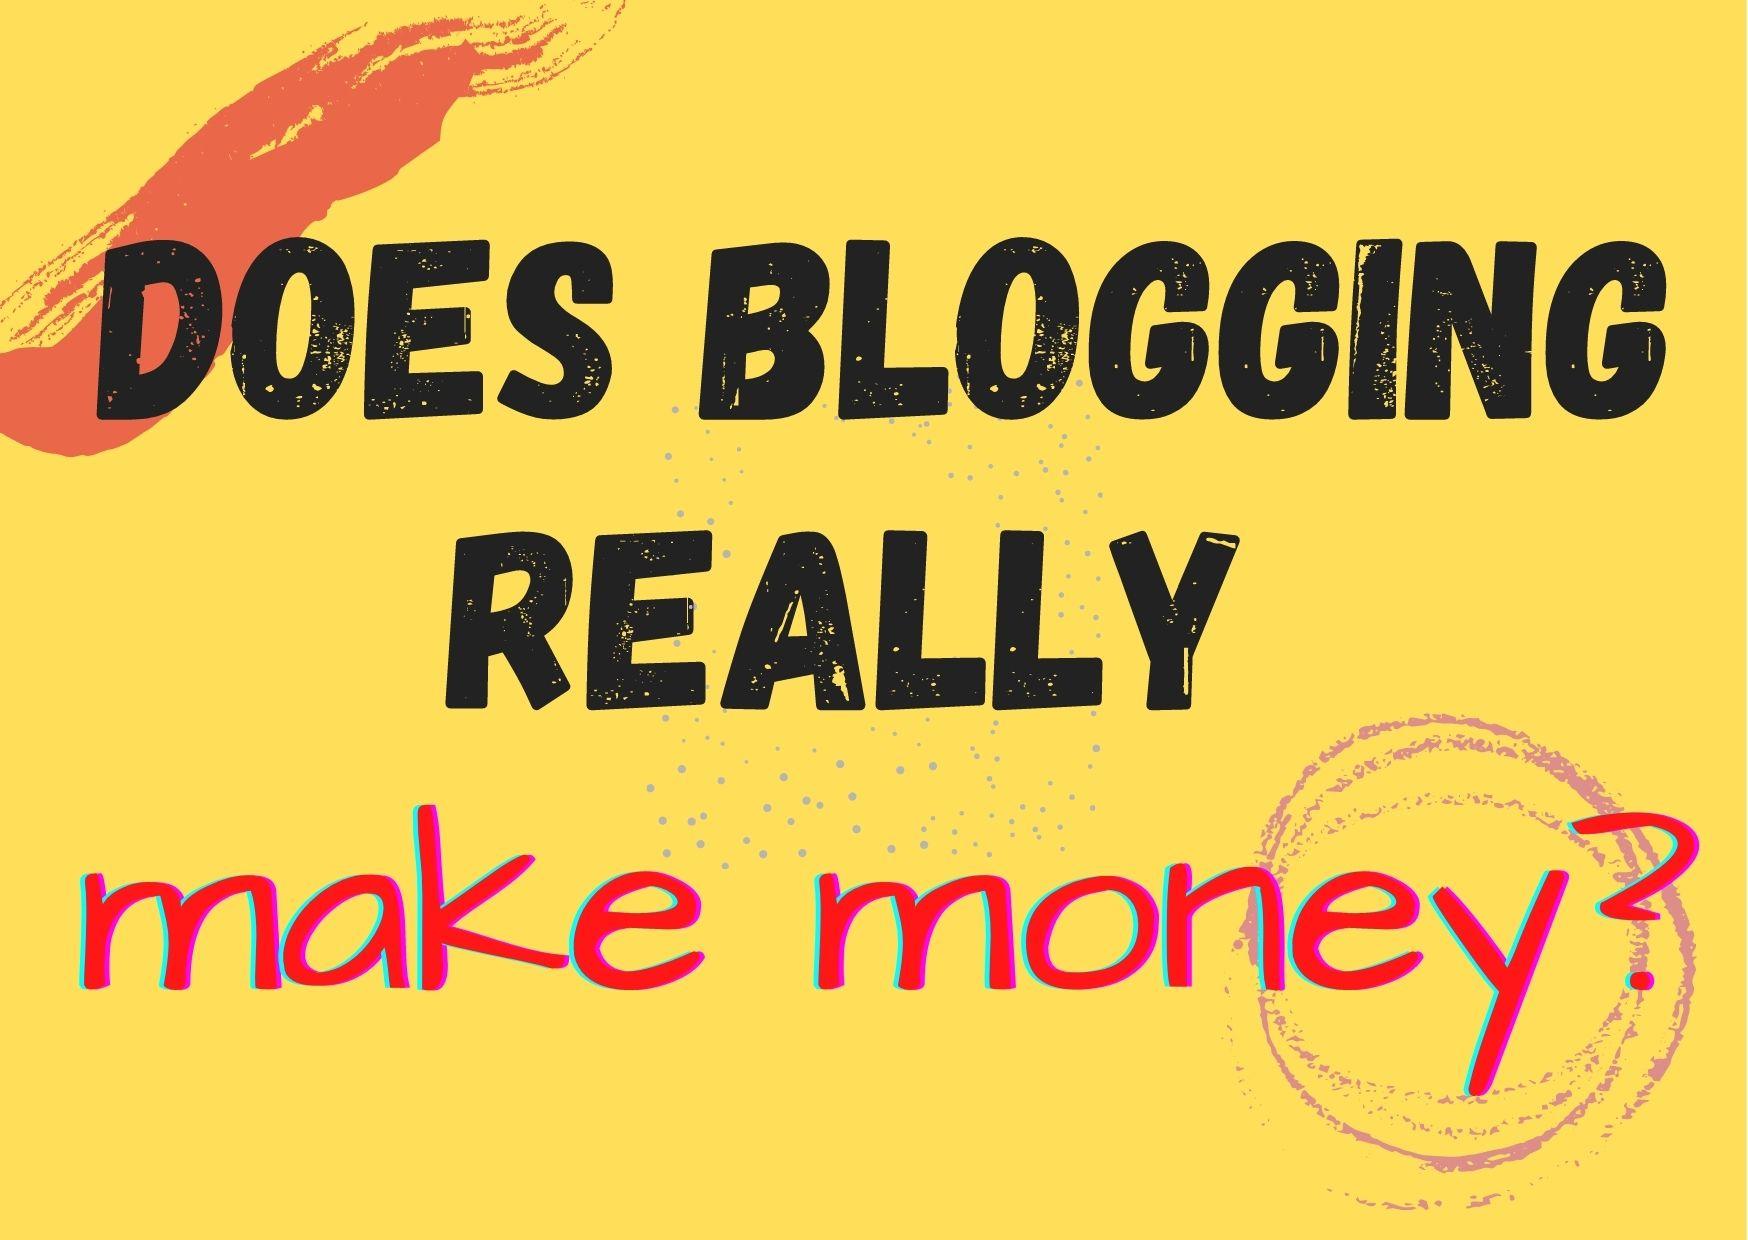 Does blogging really make money